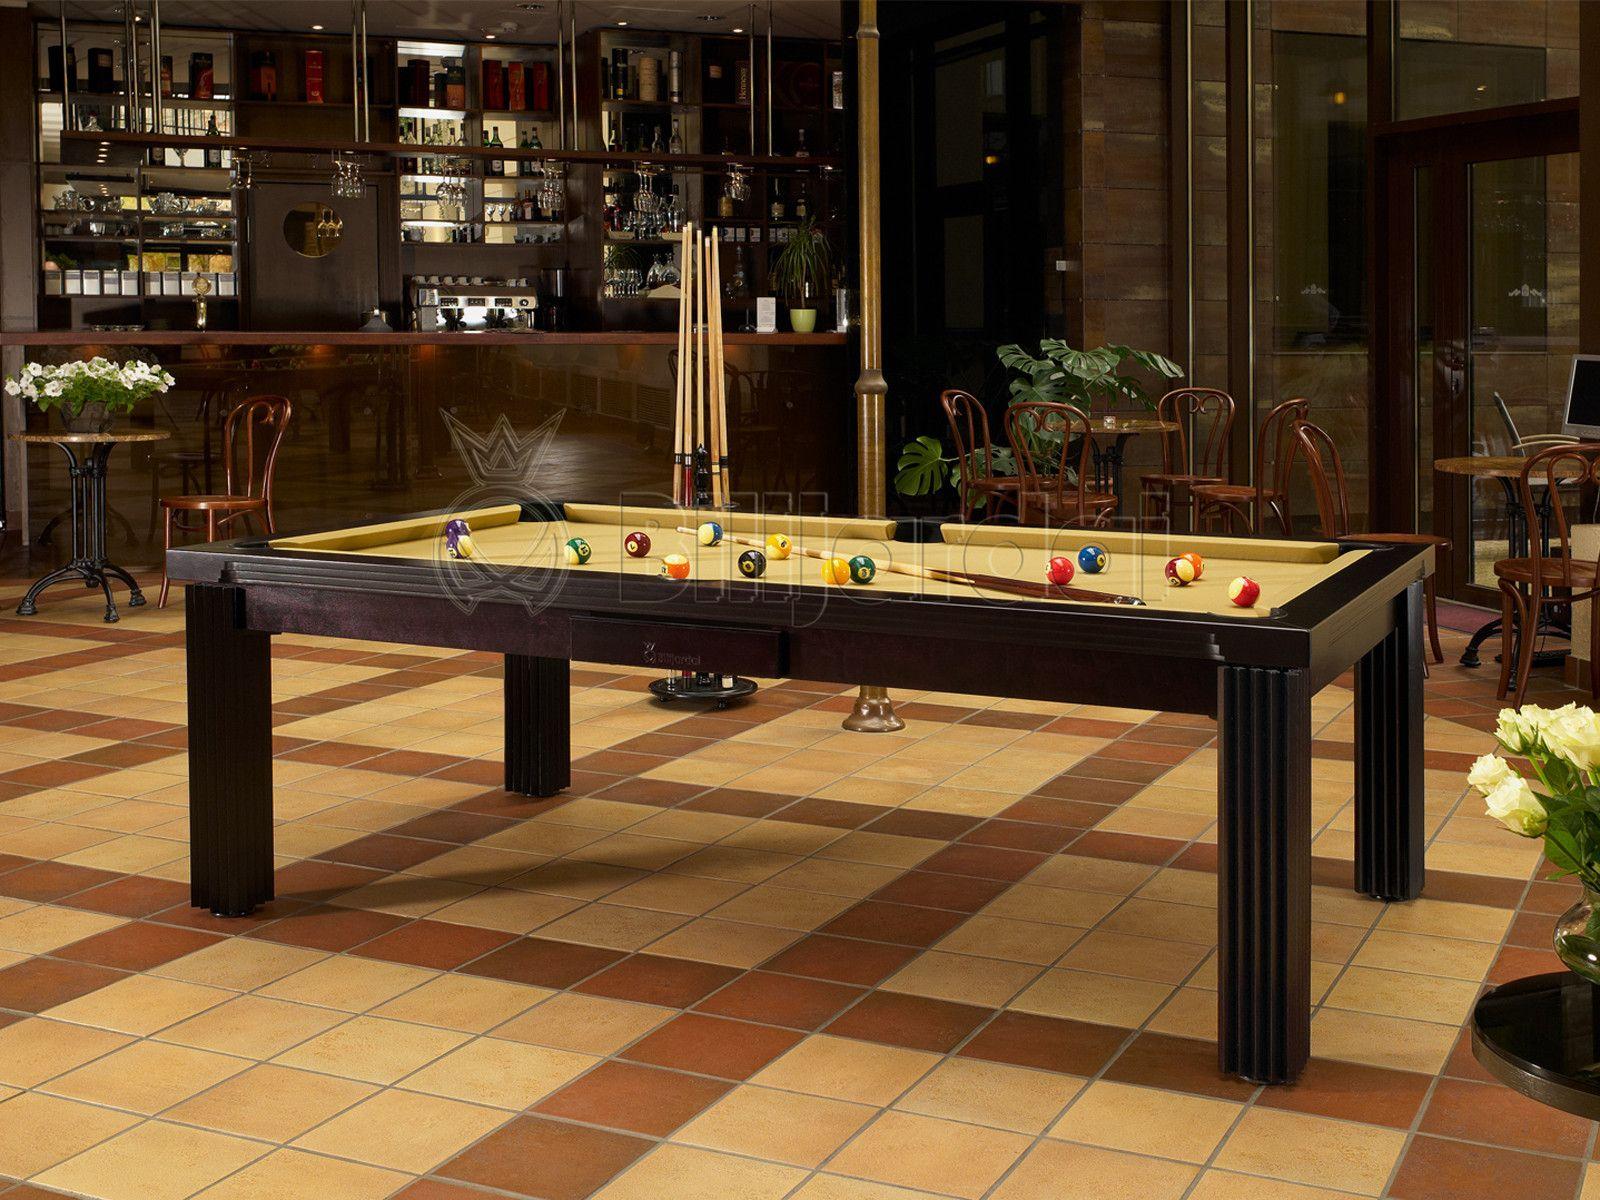 Bilijardai Toledo Dining Pool Table by Bilijardai : Buy Online at ...